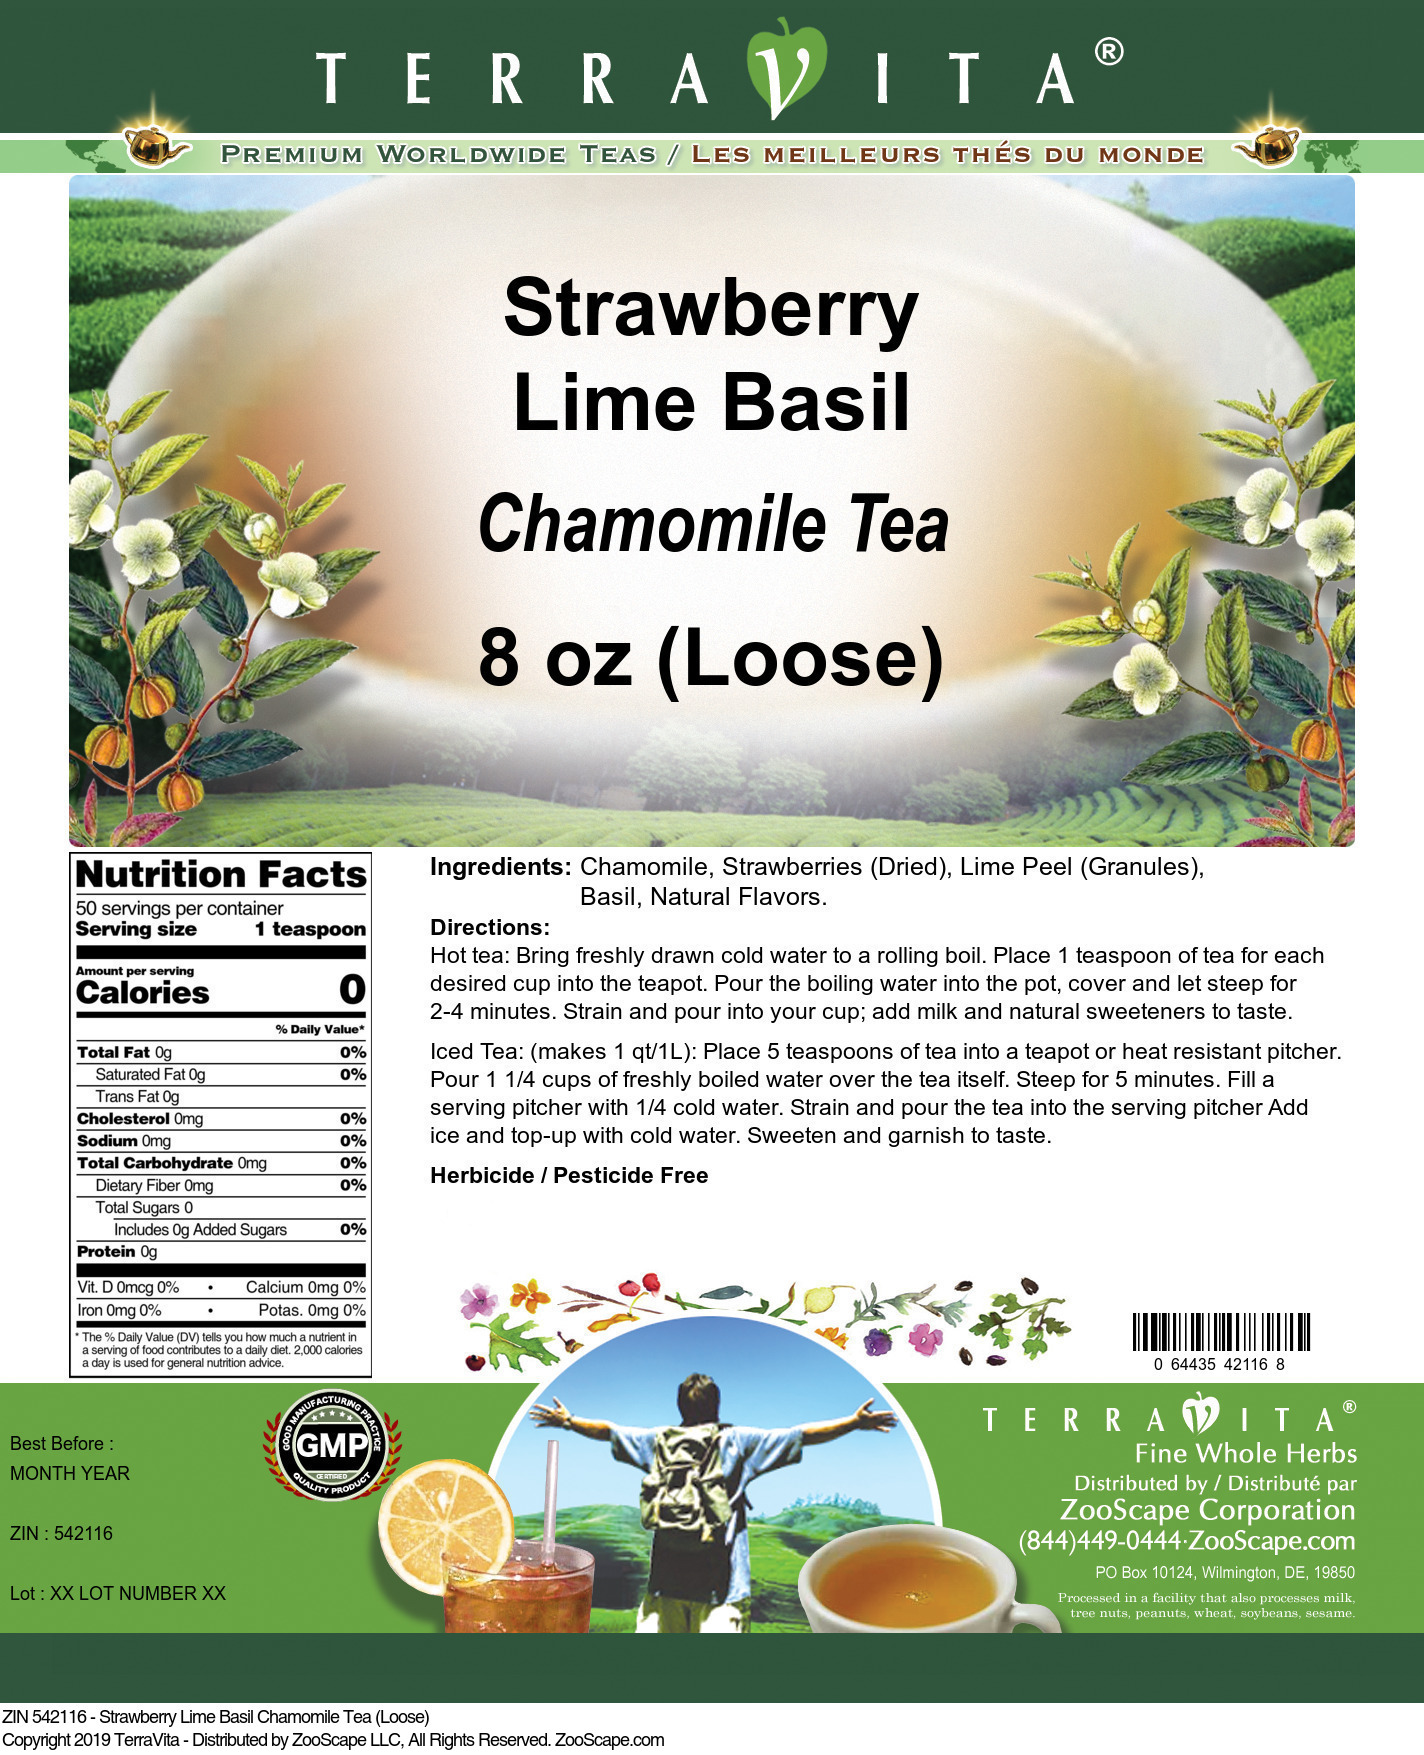 Strawberry Lime Basil Chamomile Tea (Loose)